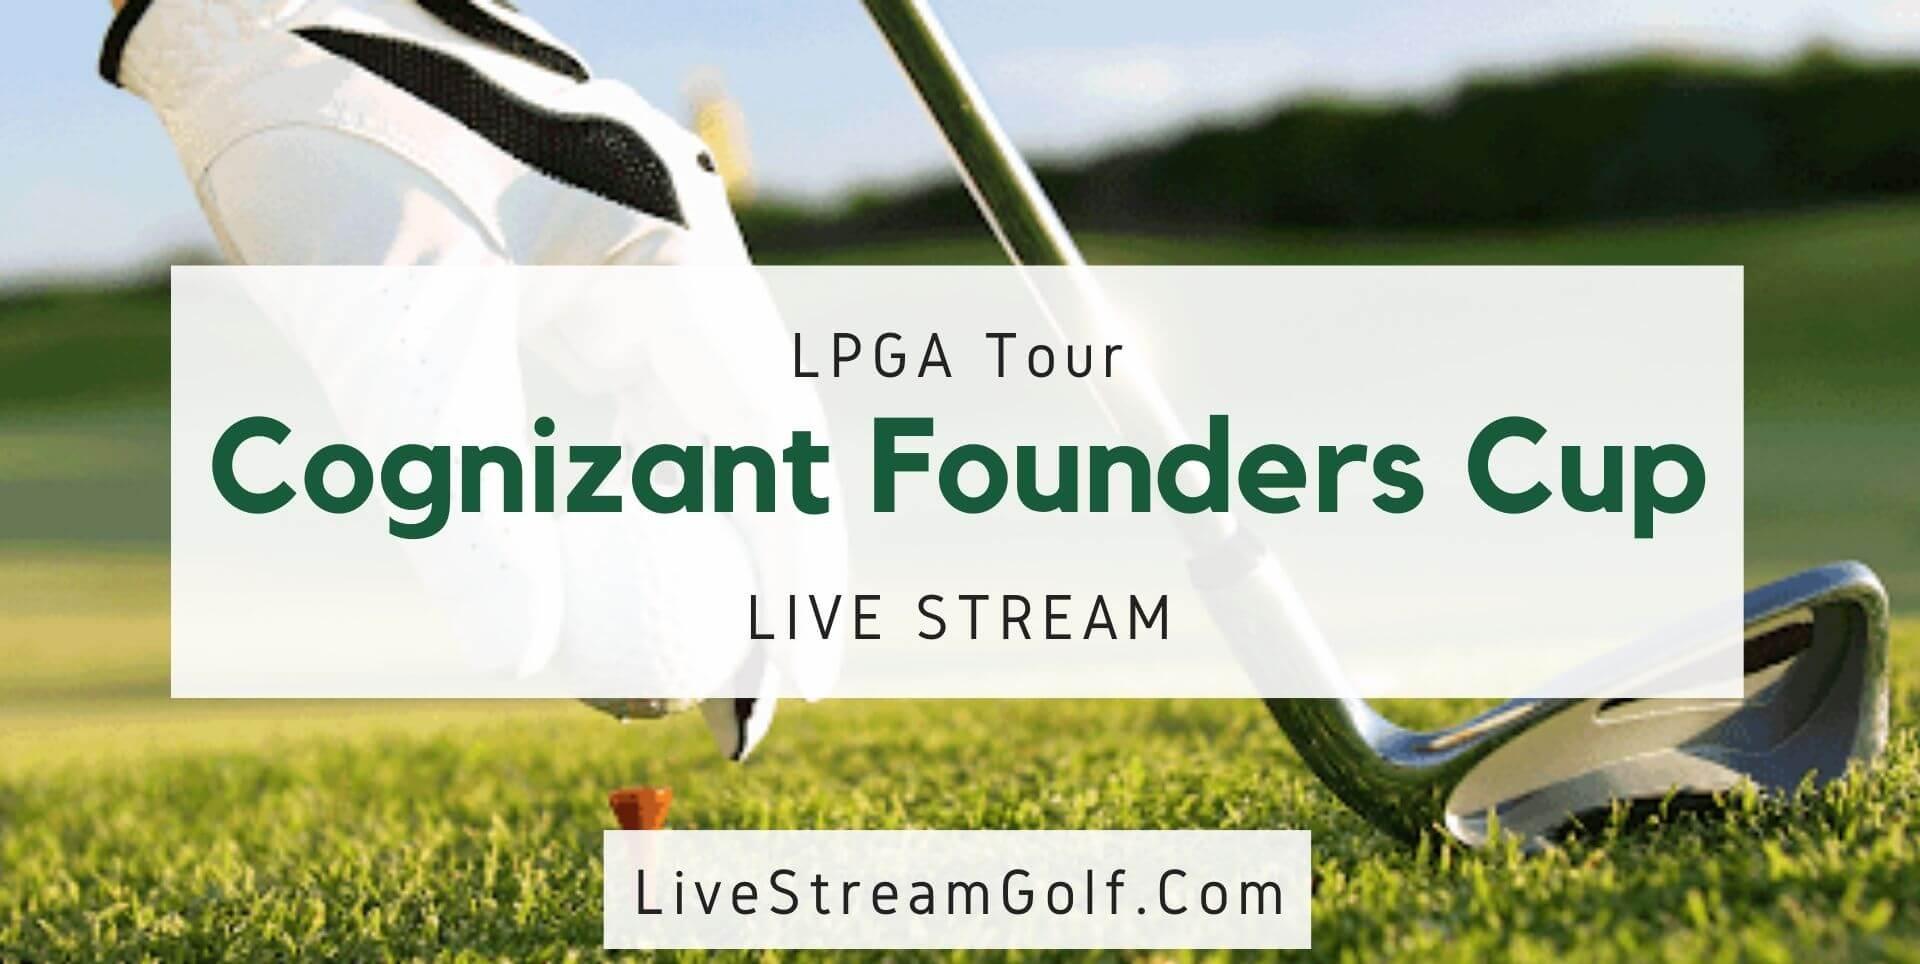 Cognizant Founders Cup Rd 2 Live Stream: LPGA Tour 2021